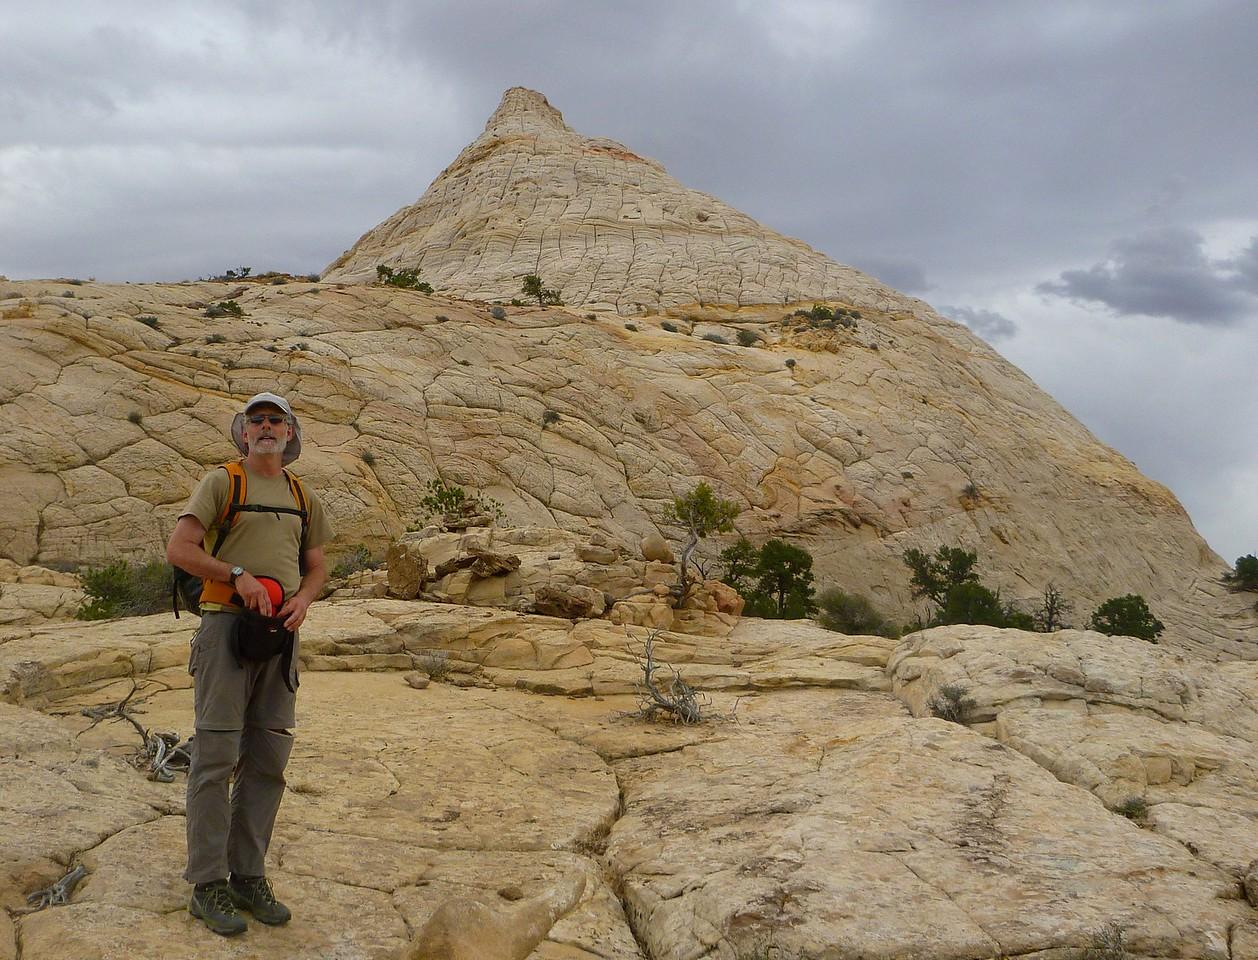 Fern Nipple hike - The summit.